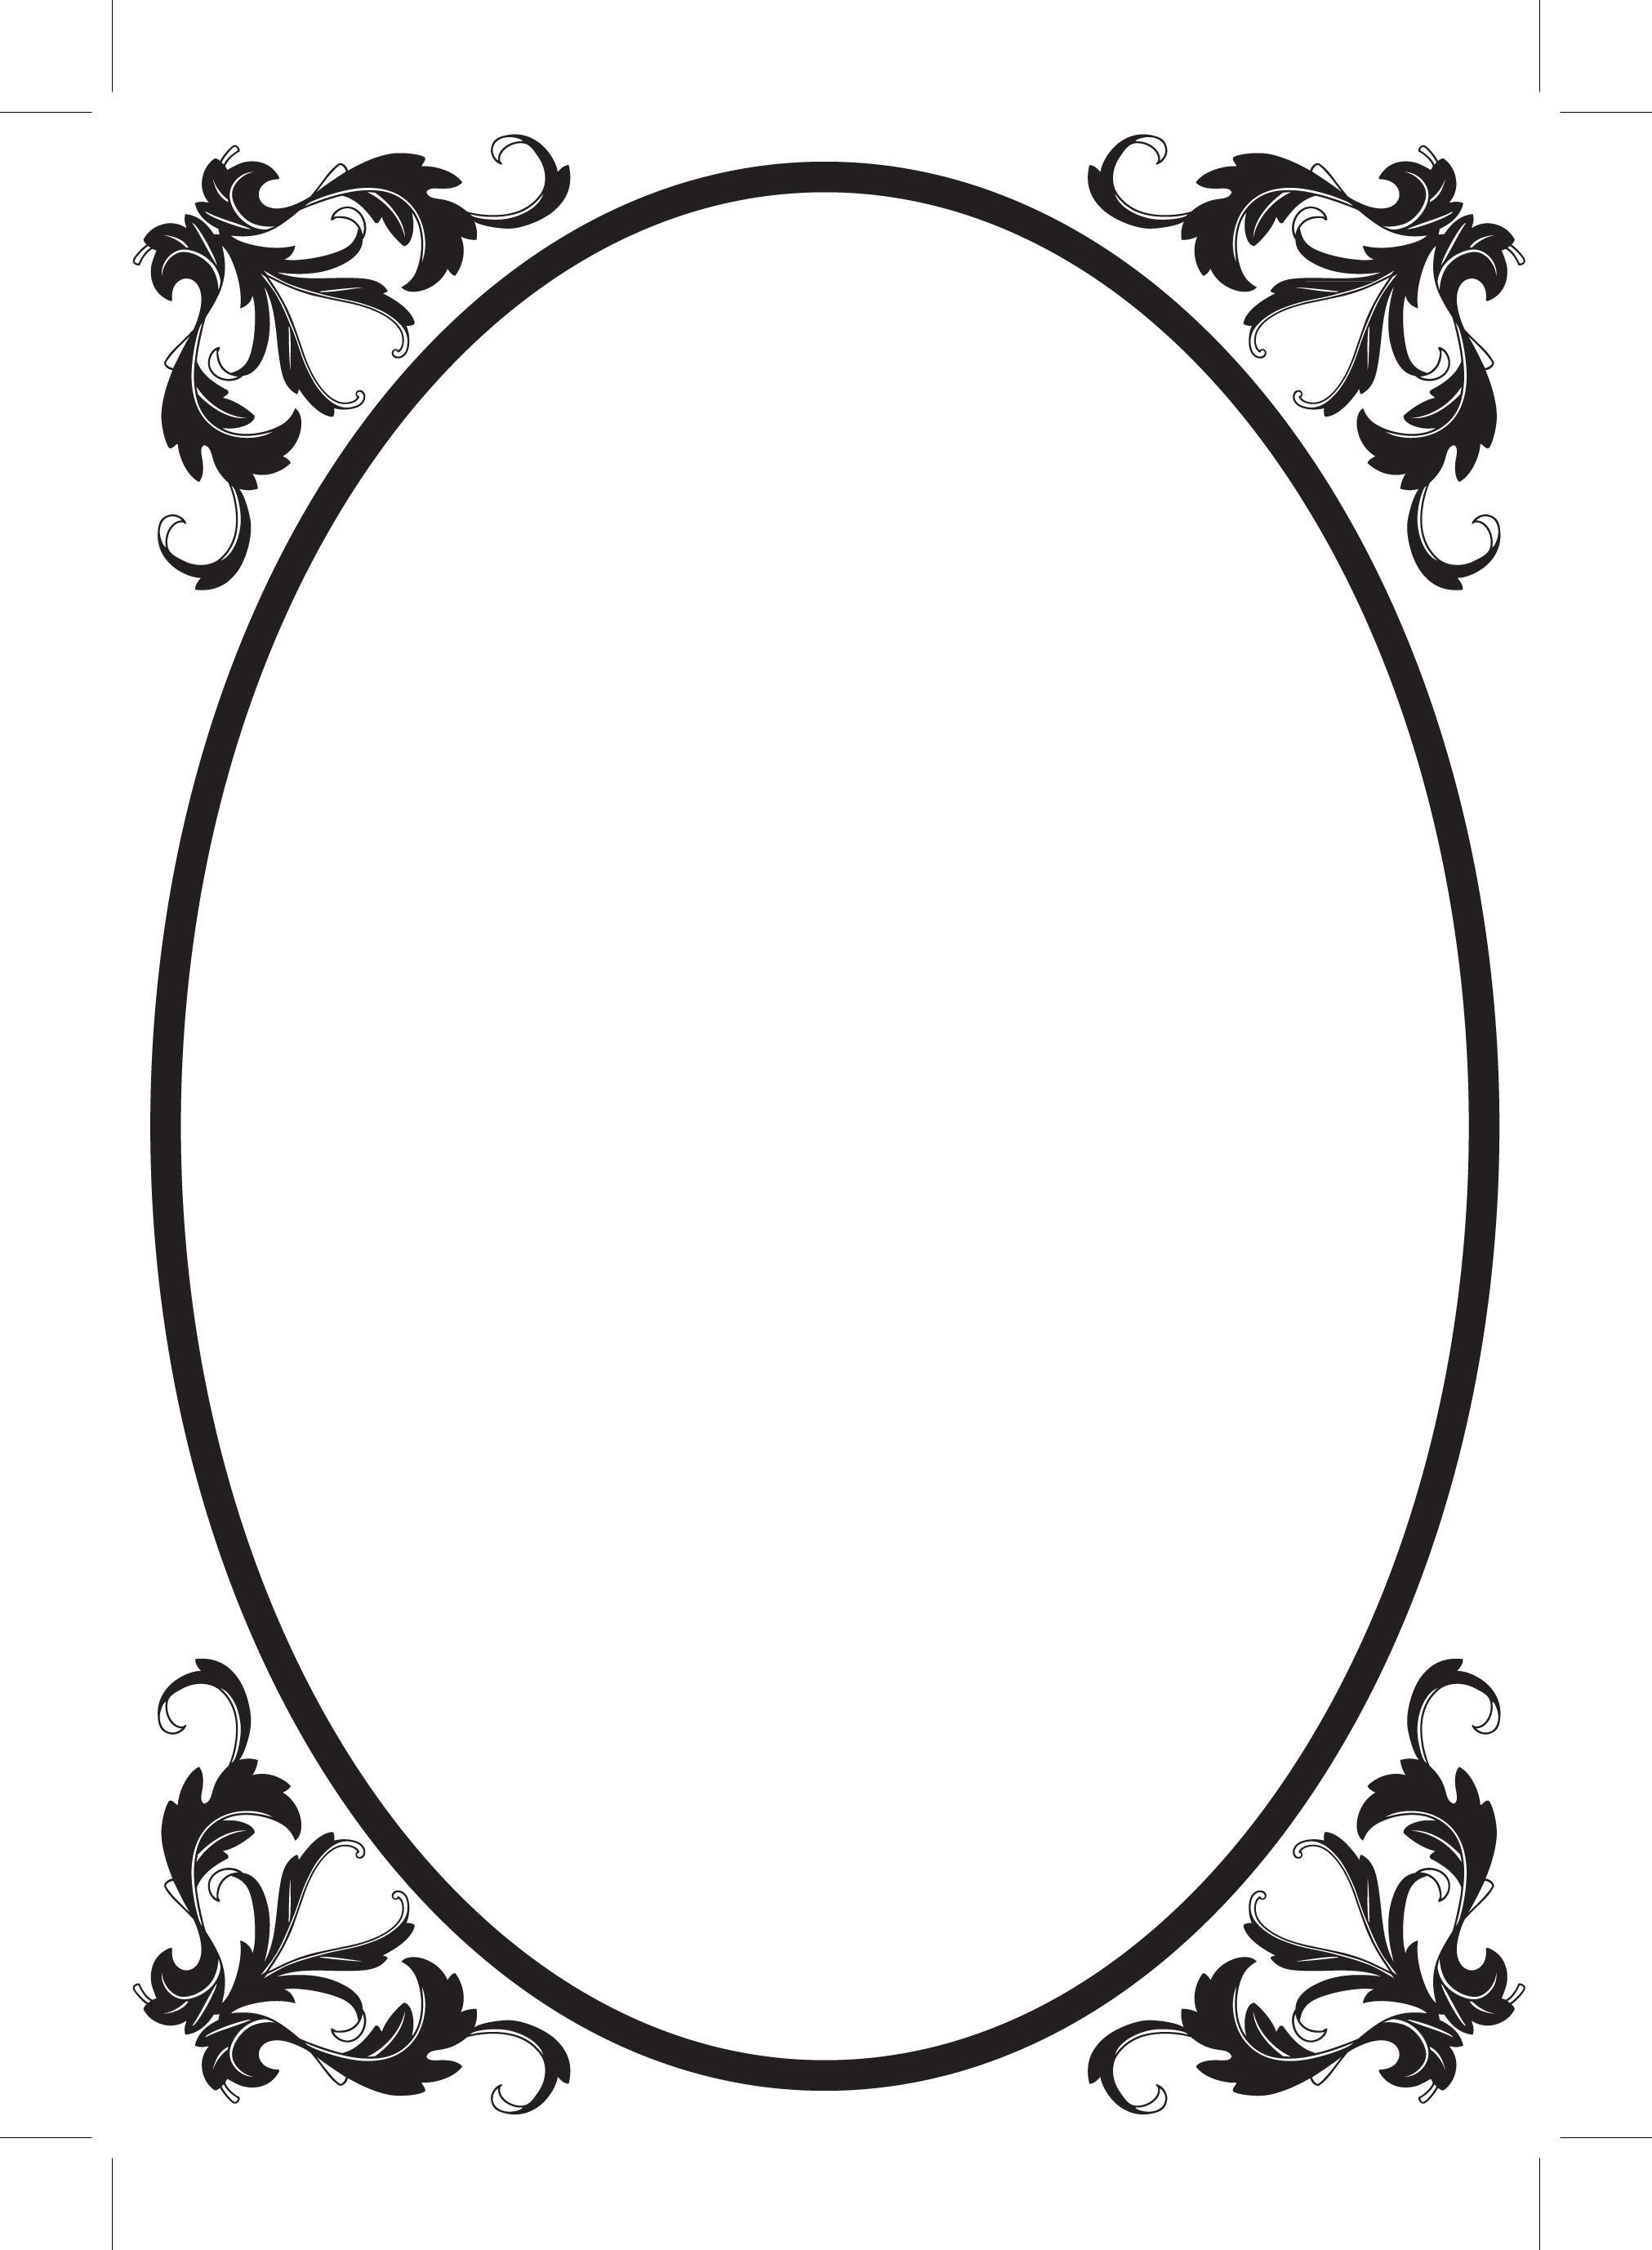 2023x2755 Oval Filigree Frame Clip Art